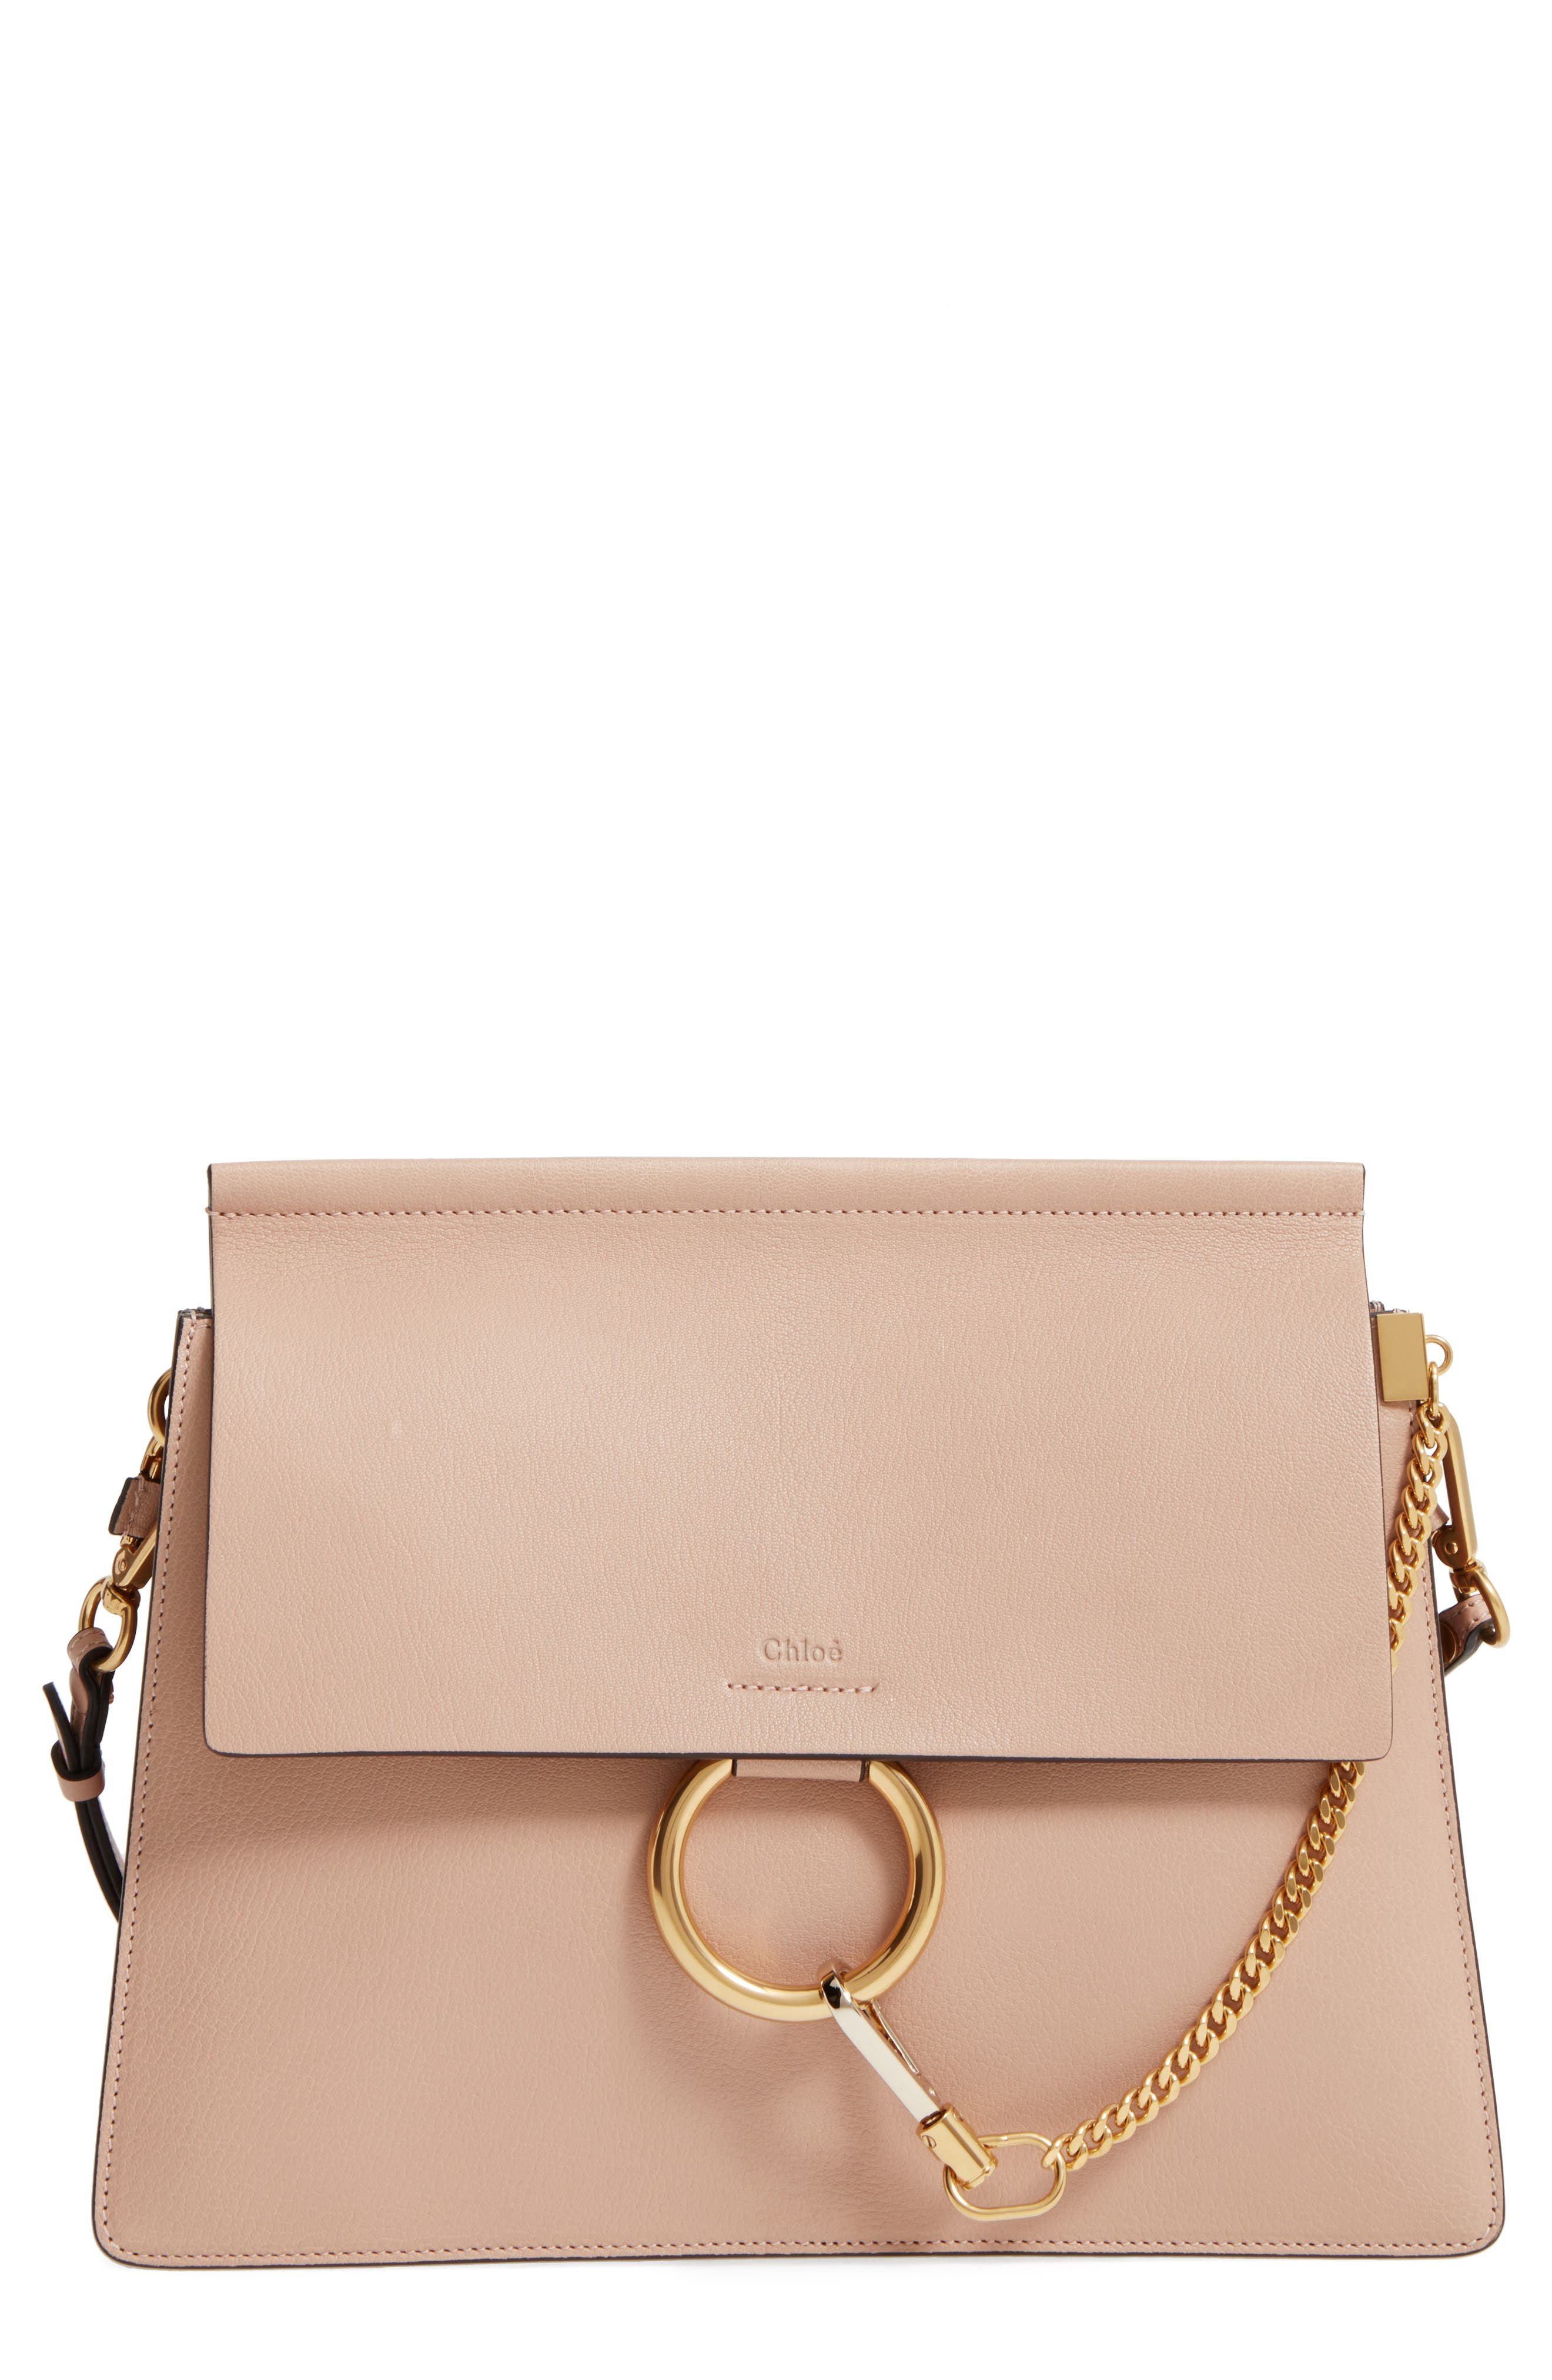 Main Image - Chloé Faye Goatskin Leather Shoulder Bag